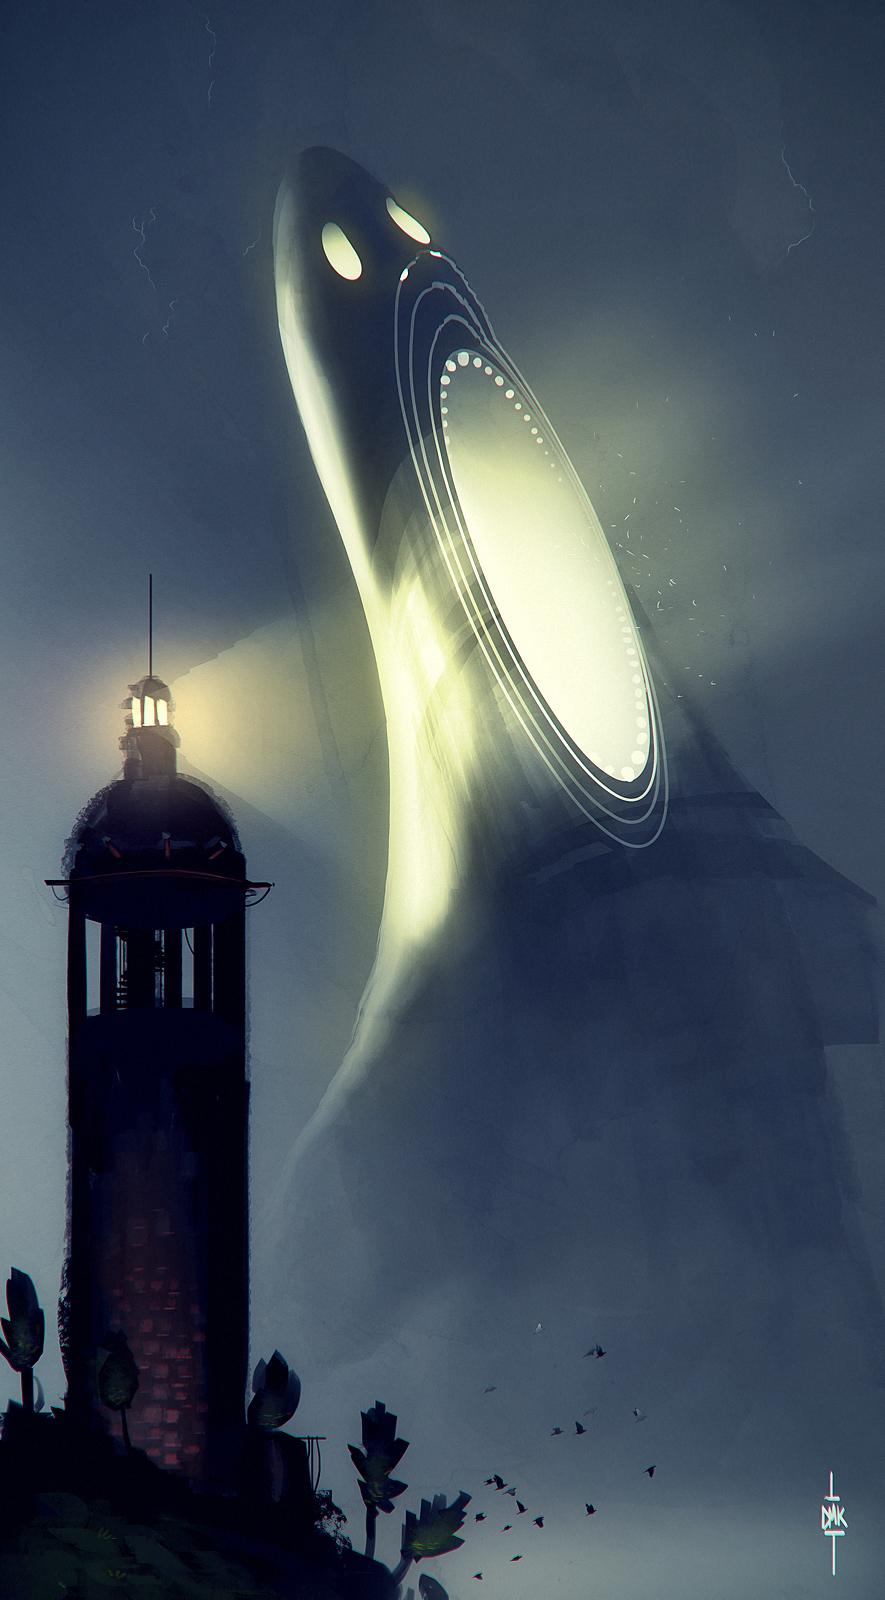 Night in the Lighthouse - Dumaker